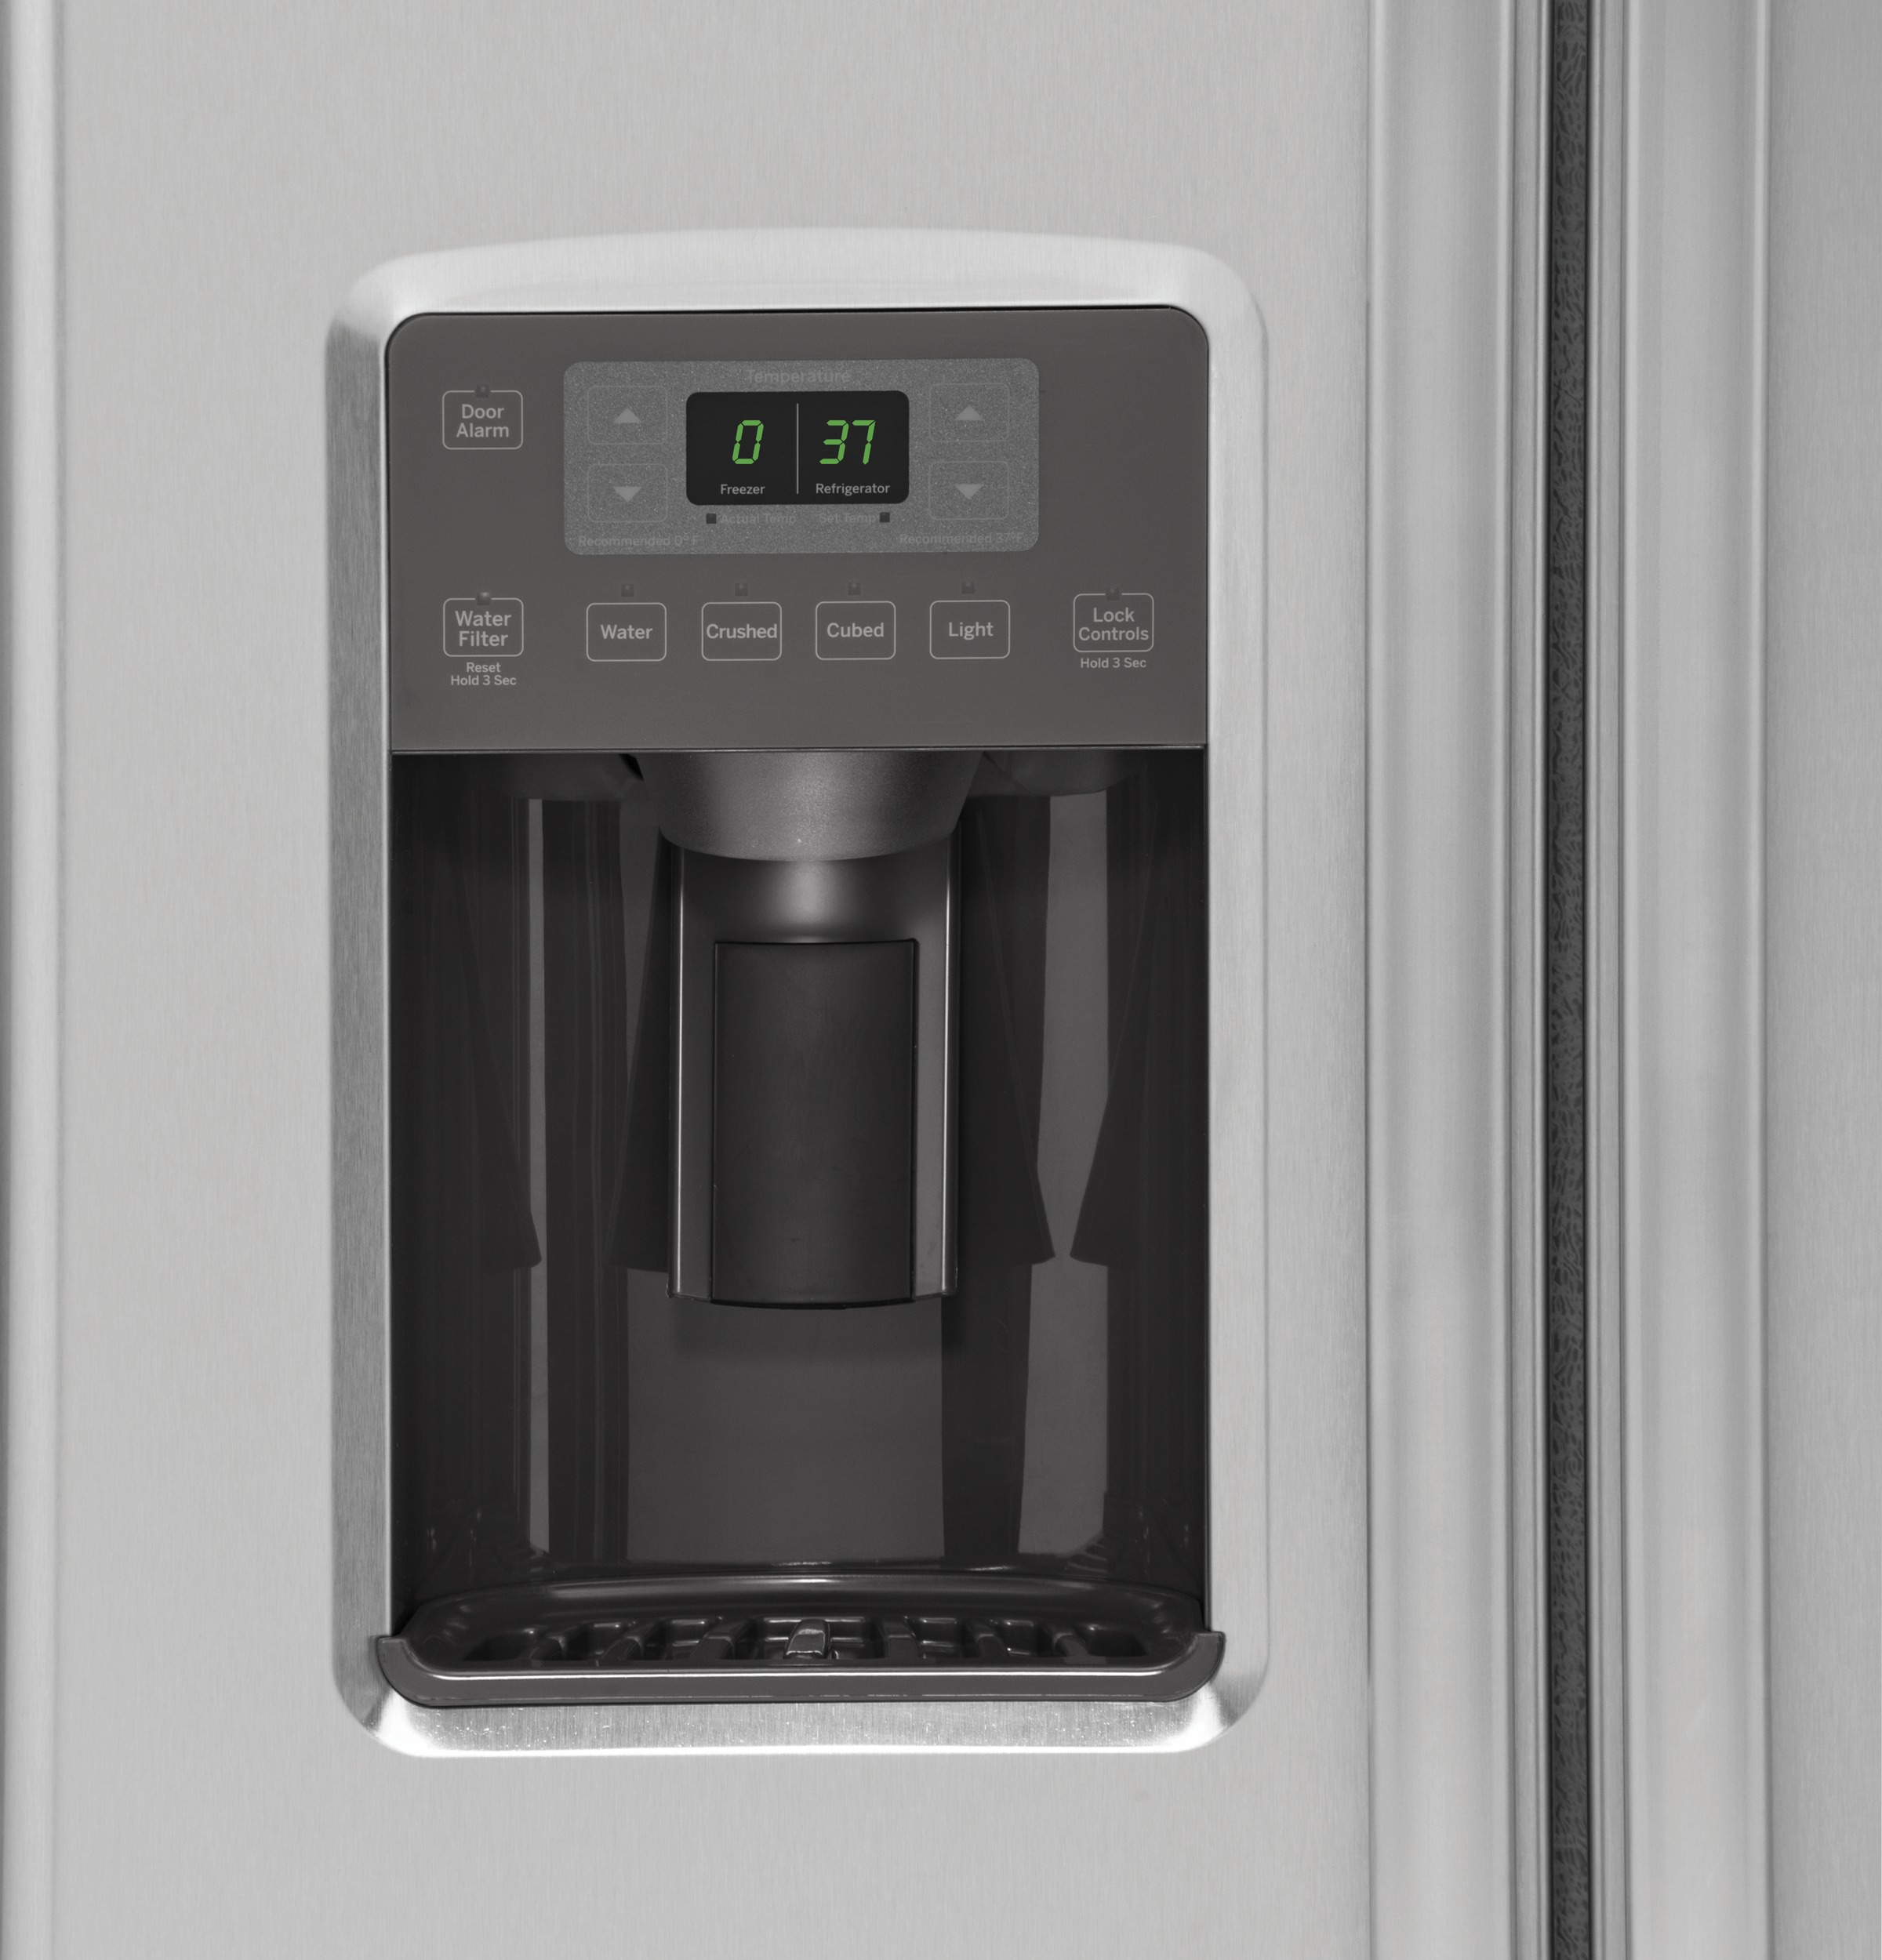 GE Appliances GZS22DSJSS 21.9 cu. ft. Counter-Depth Side-by-Side Refrigerator - Stainless Steel